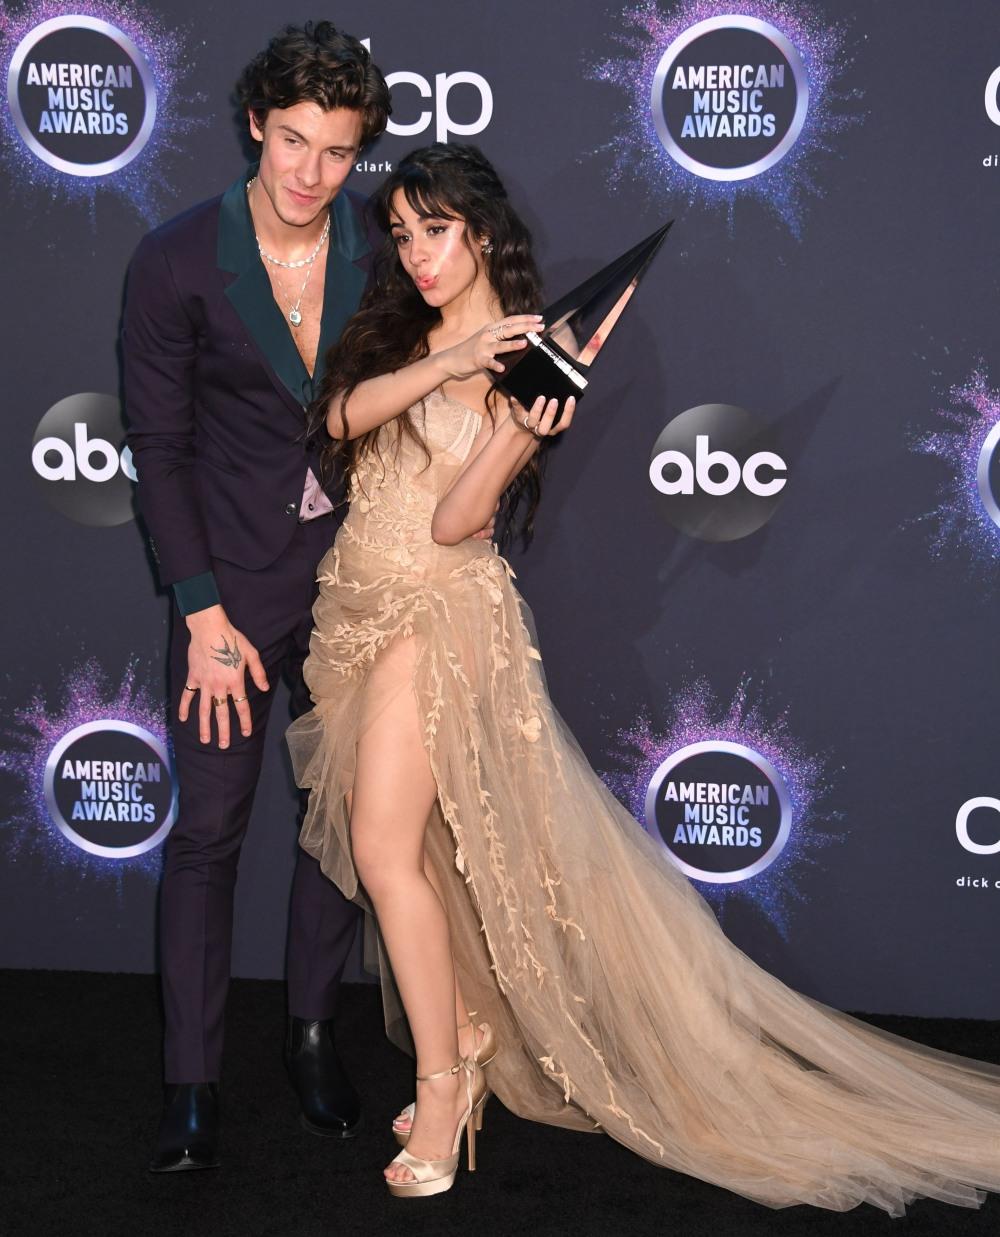 Shawn Mendes, Camila Cabello in the press room at the 2019 American Music Awards at Microsoft Theater on November 24, 2019 in Los Angeles, California.© J Graylock/jpistudios.com